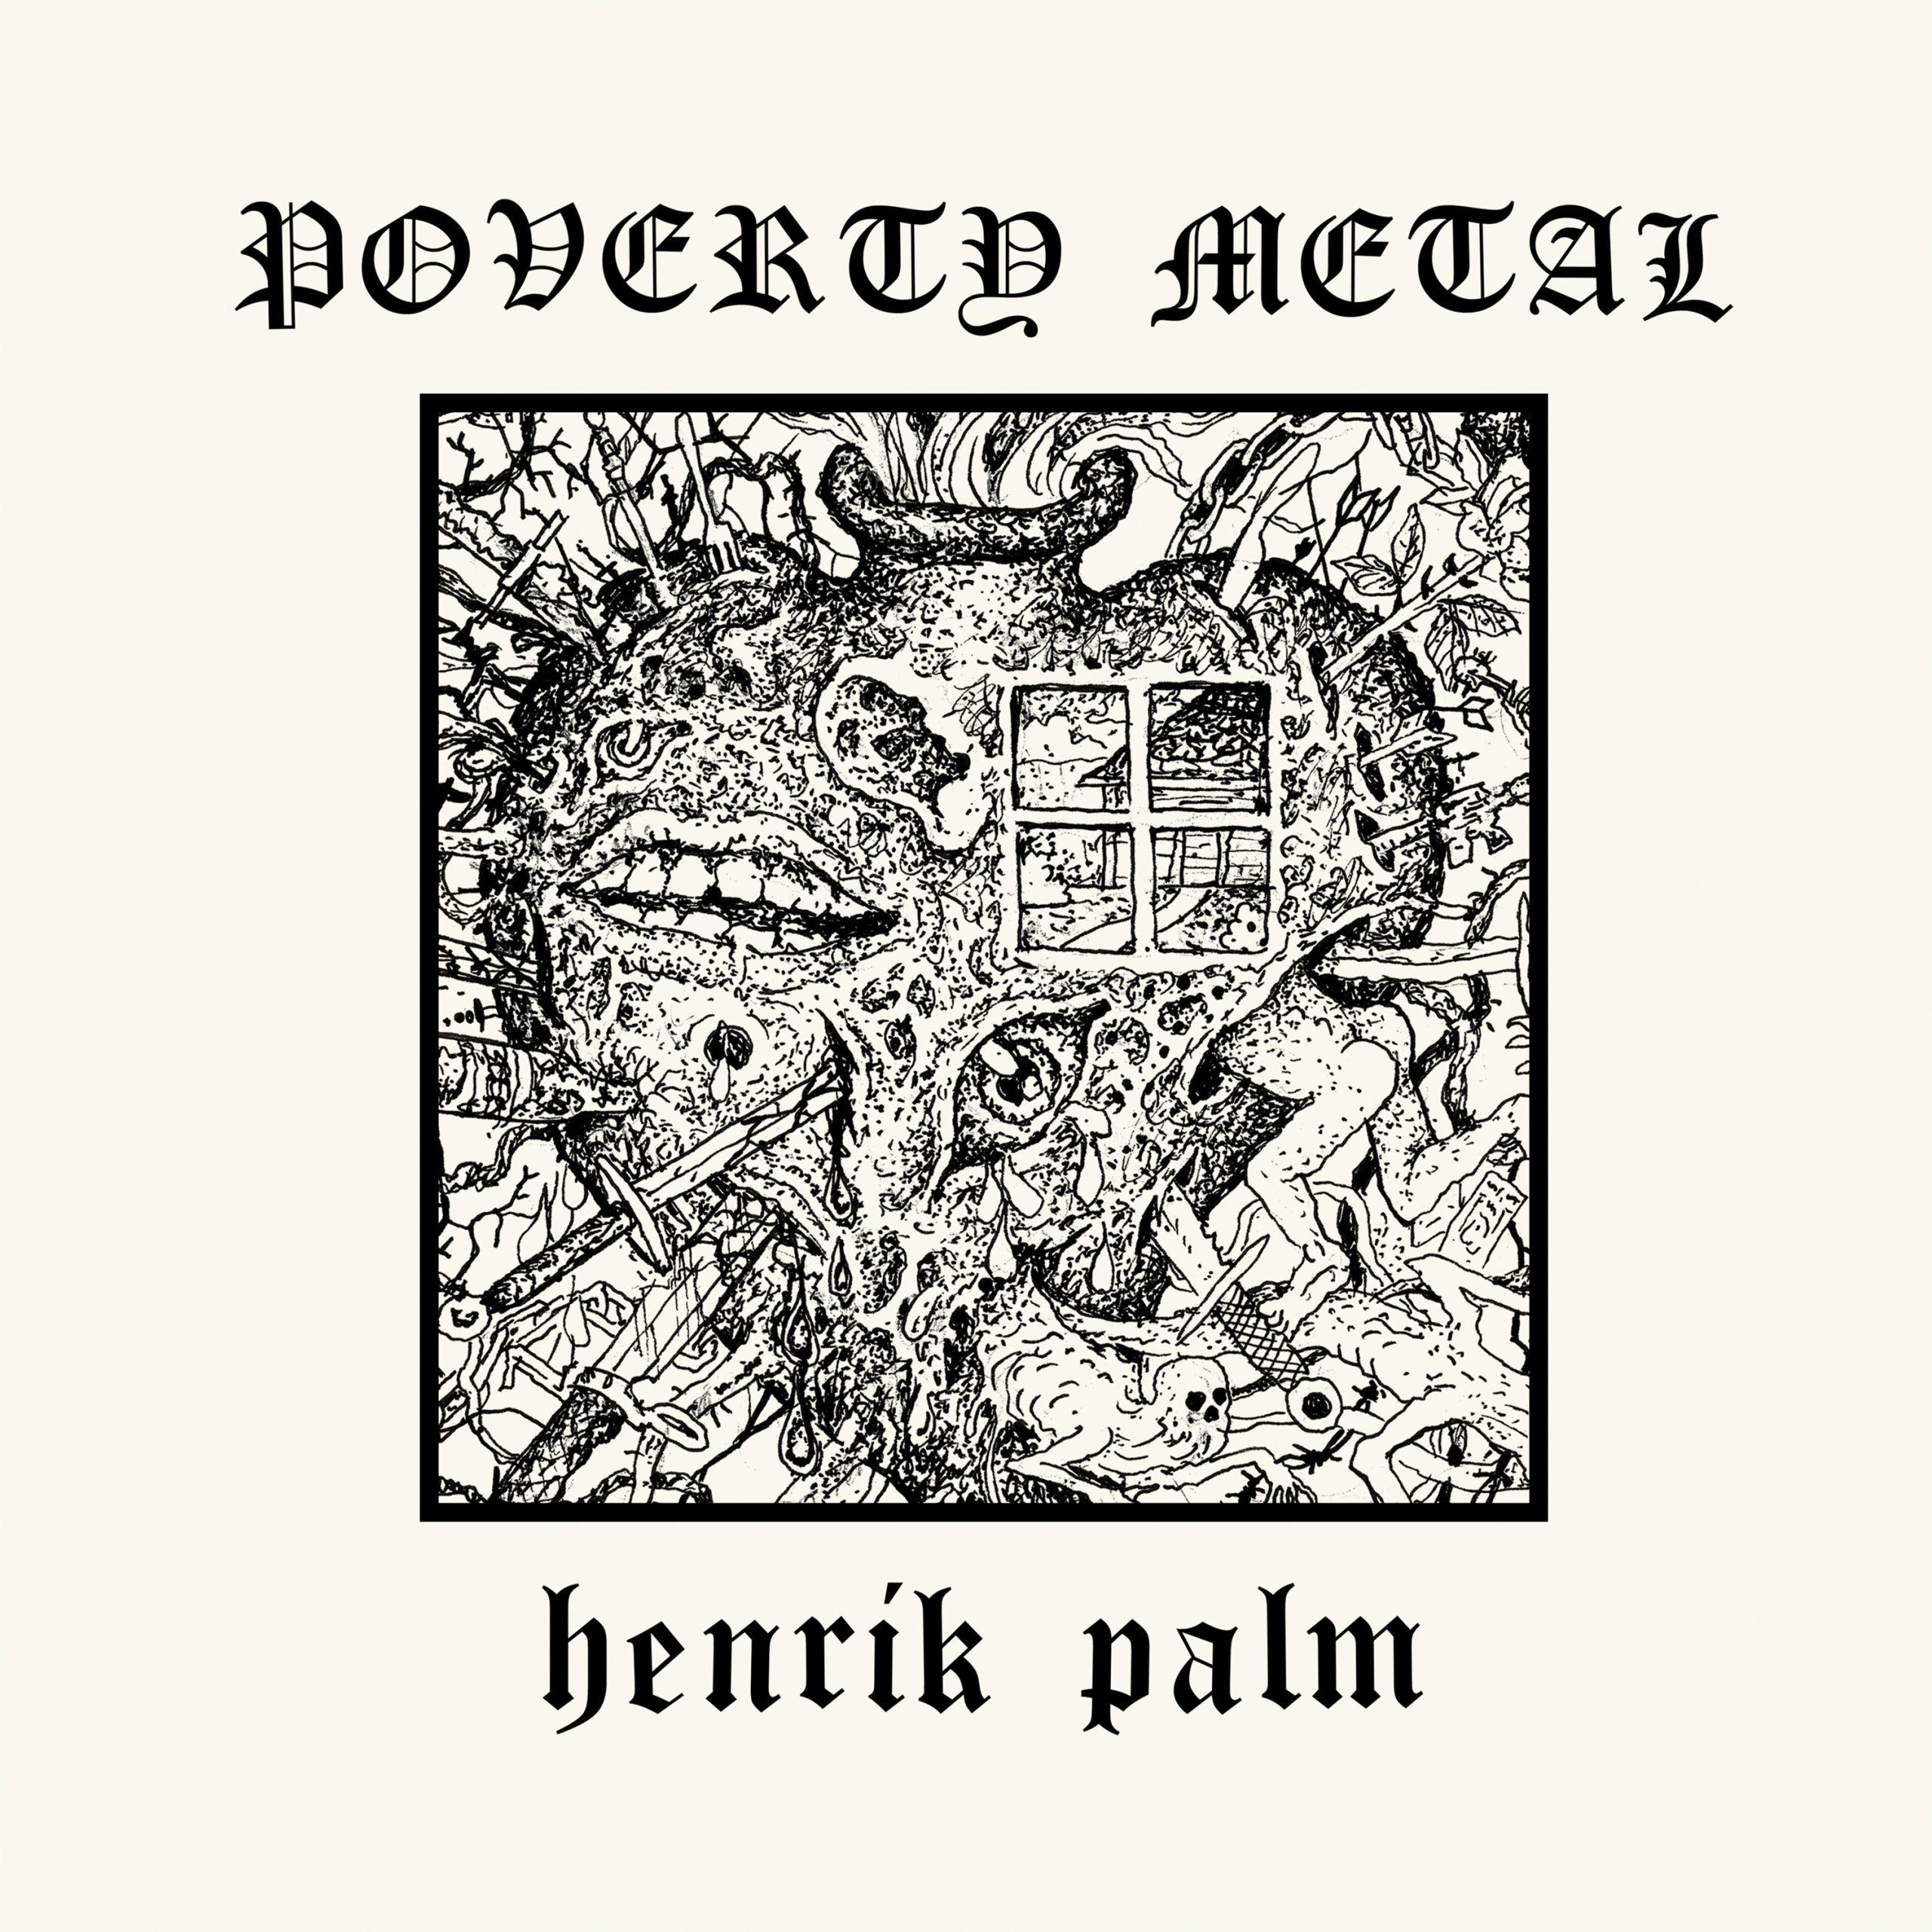 henrik palm poverty metal cover artwork